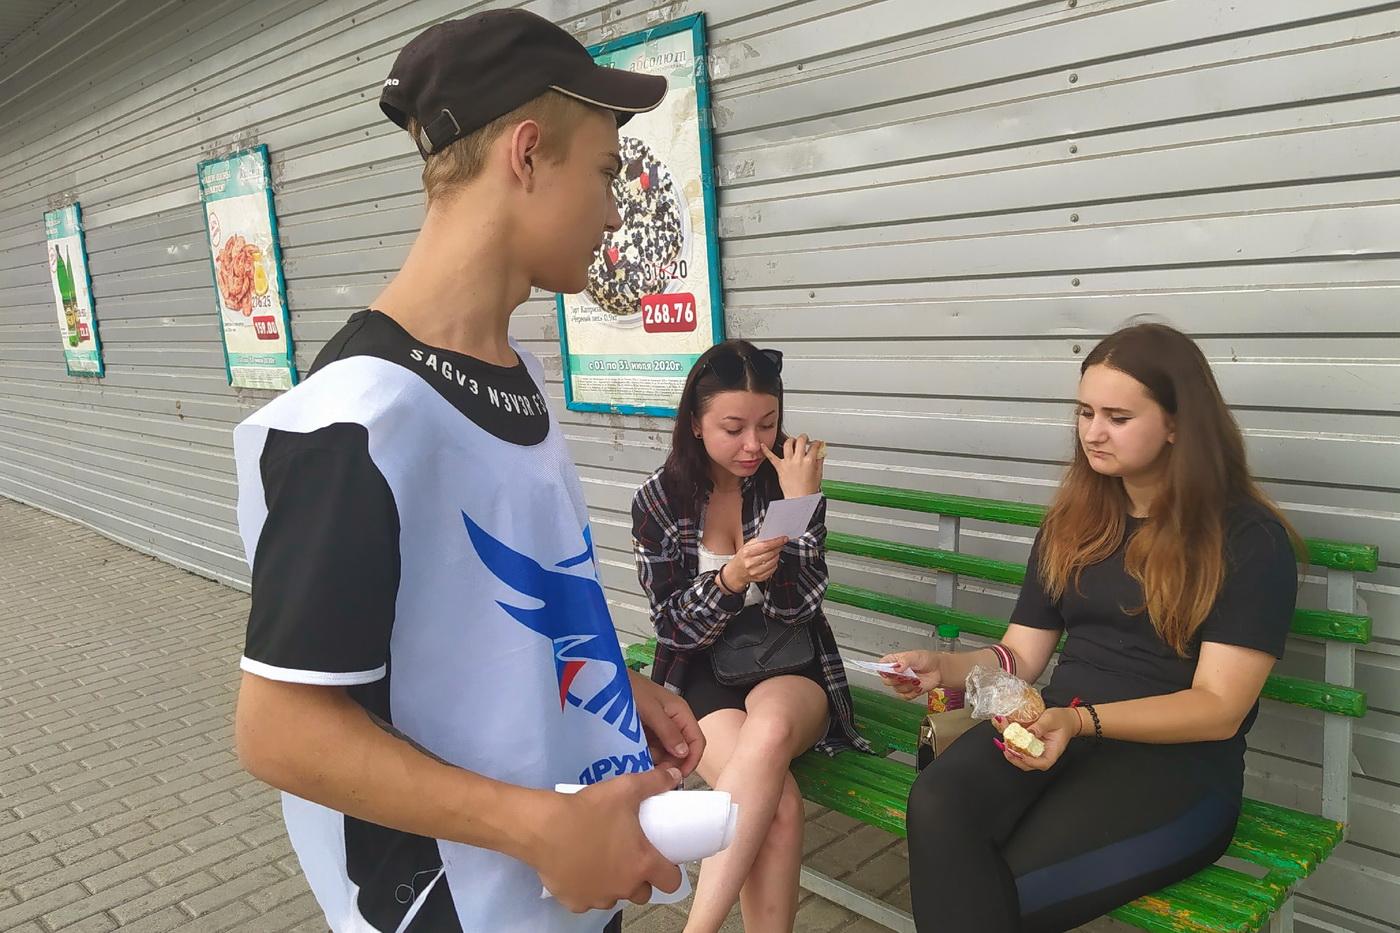 Активисты проекта «Дружина» раздали листовки об акции «Стоп наркотикам!» в Свердловске 1